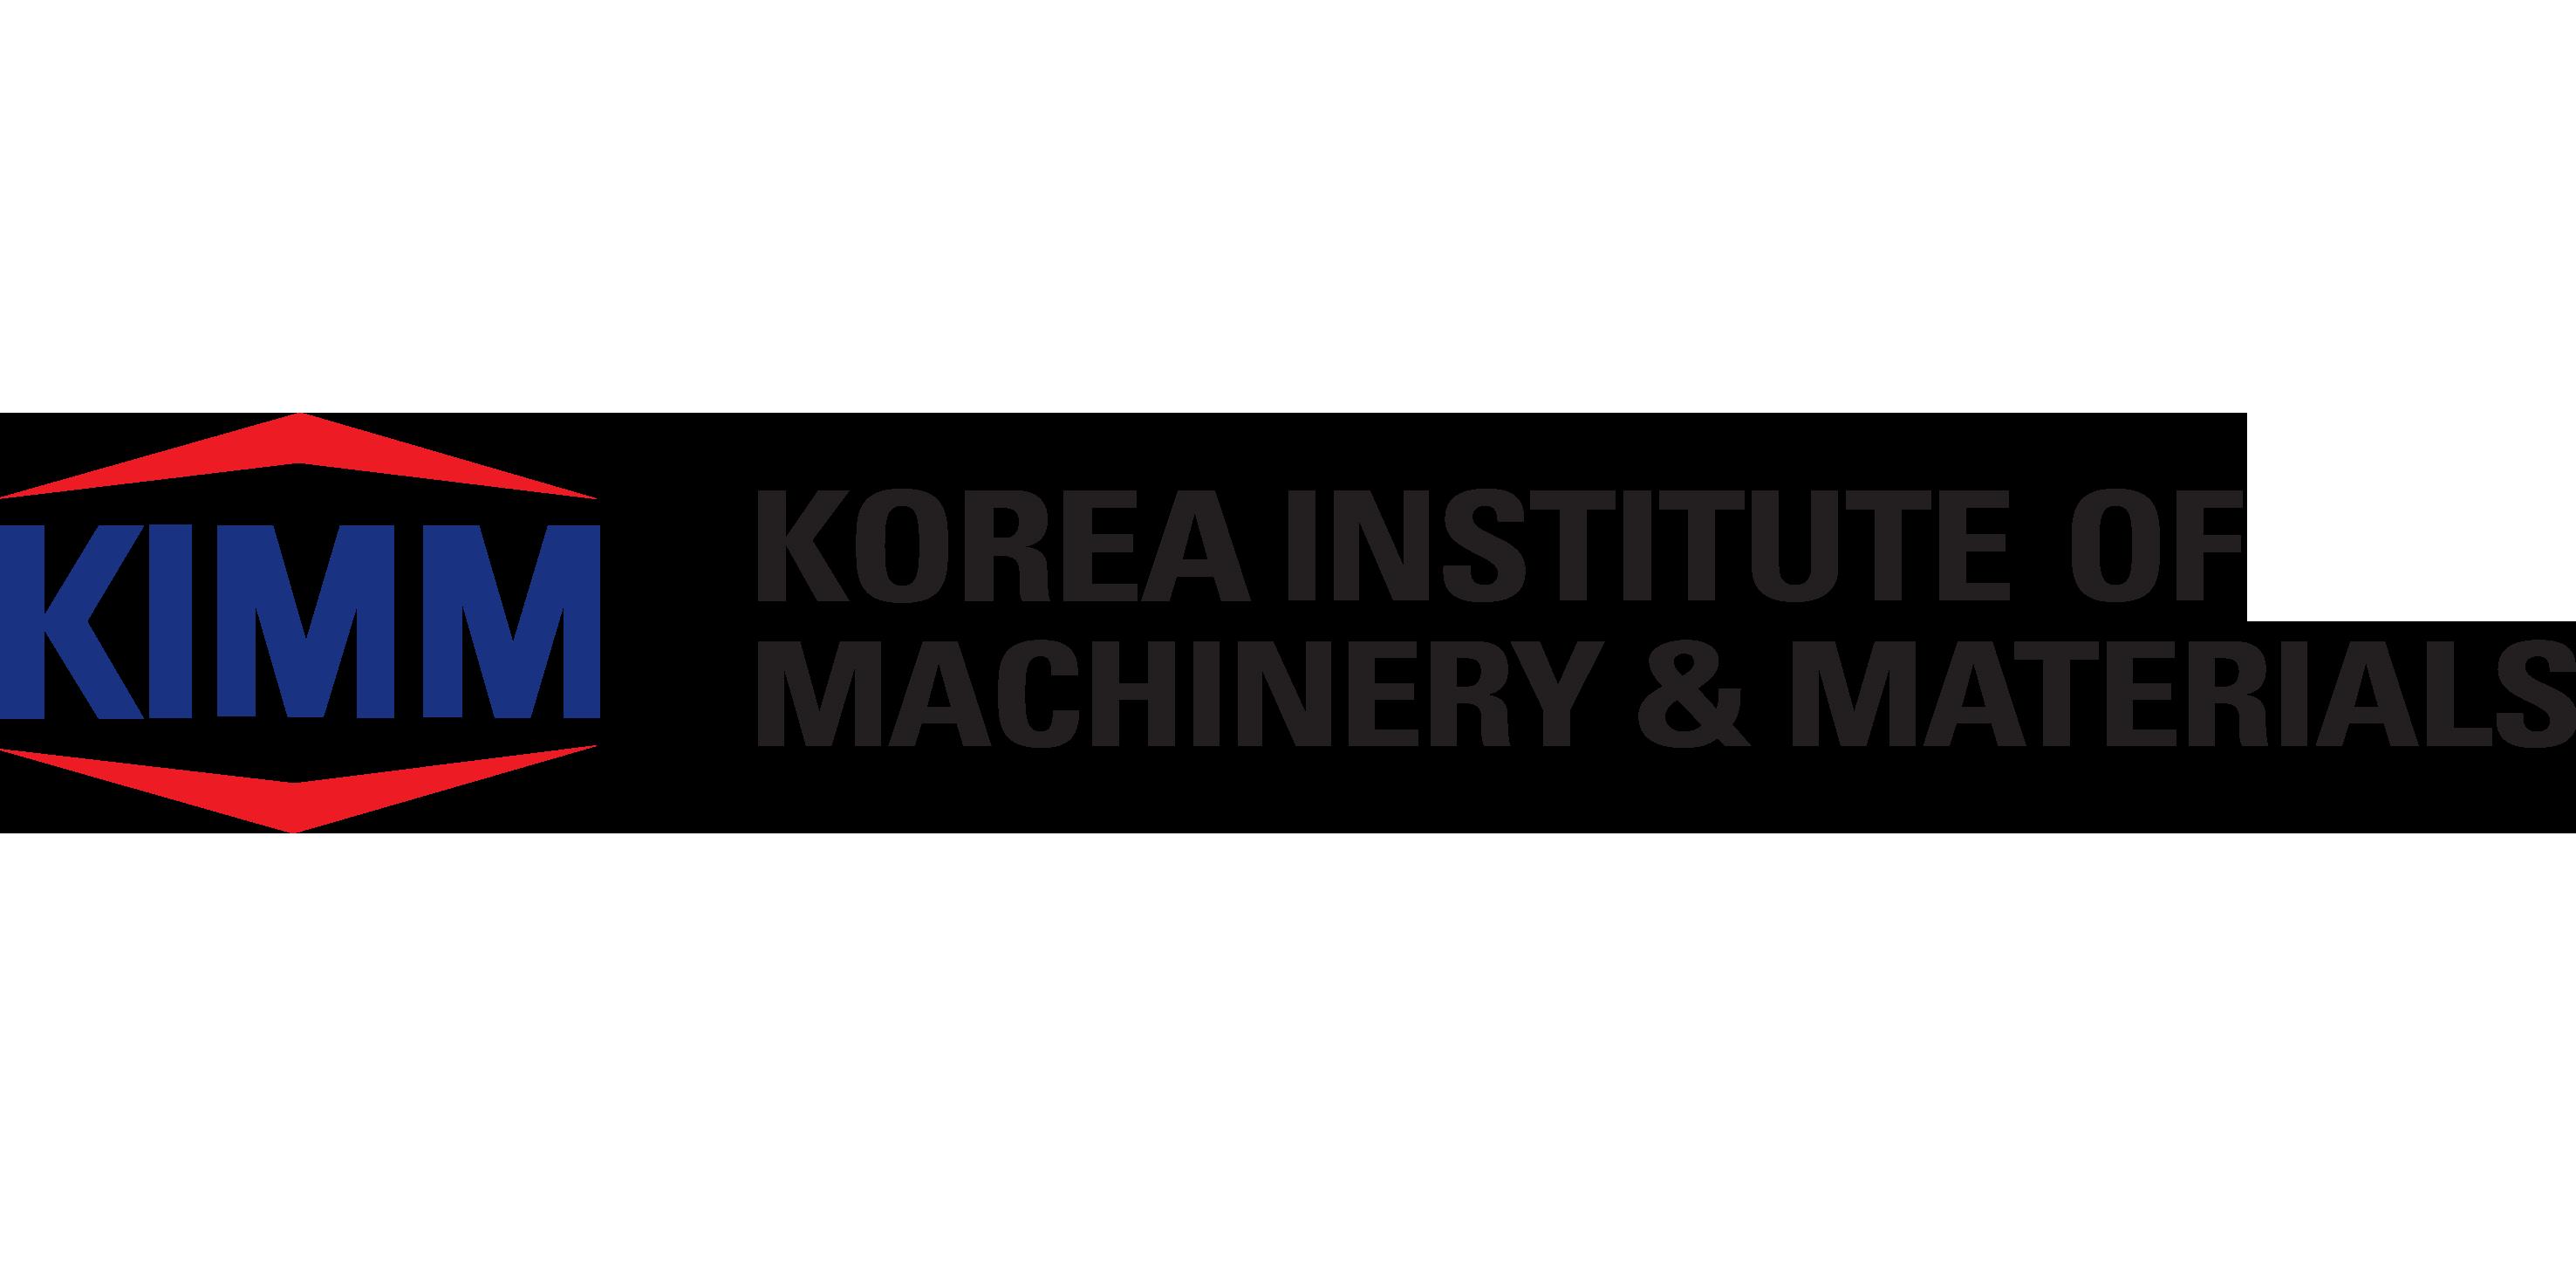 Image result for KIMM Korea